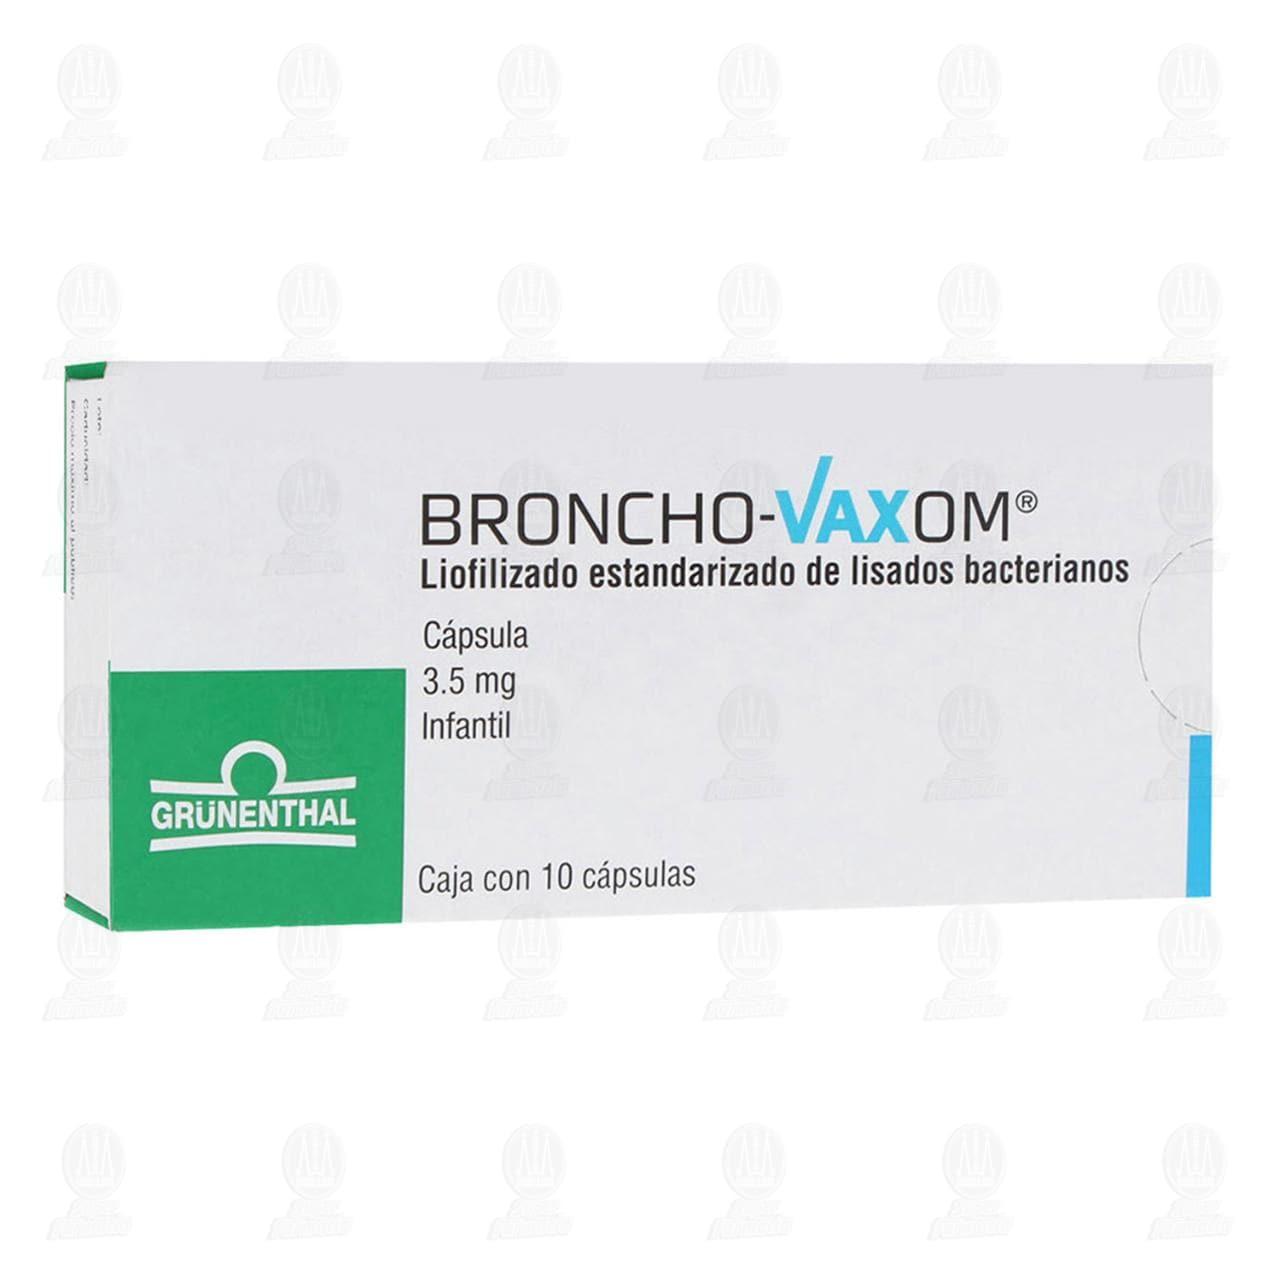 Comprar Broncho Vaxom Infantil 3.5mg 10 Cápsulas en Farmacias Guadalajara